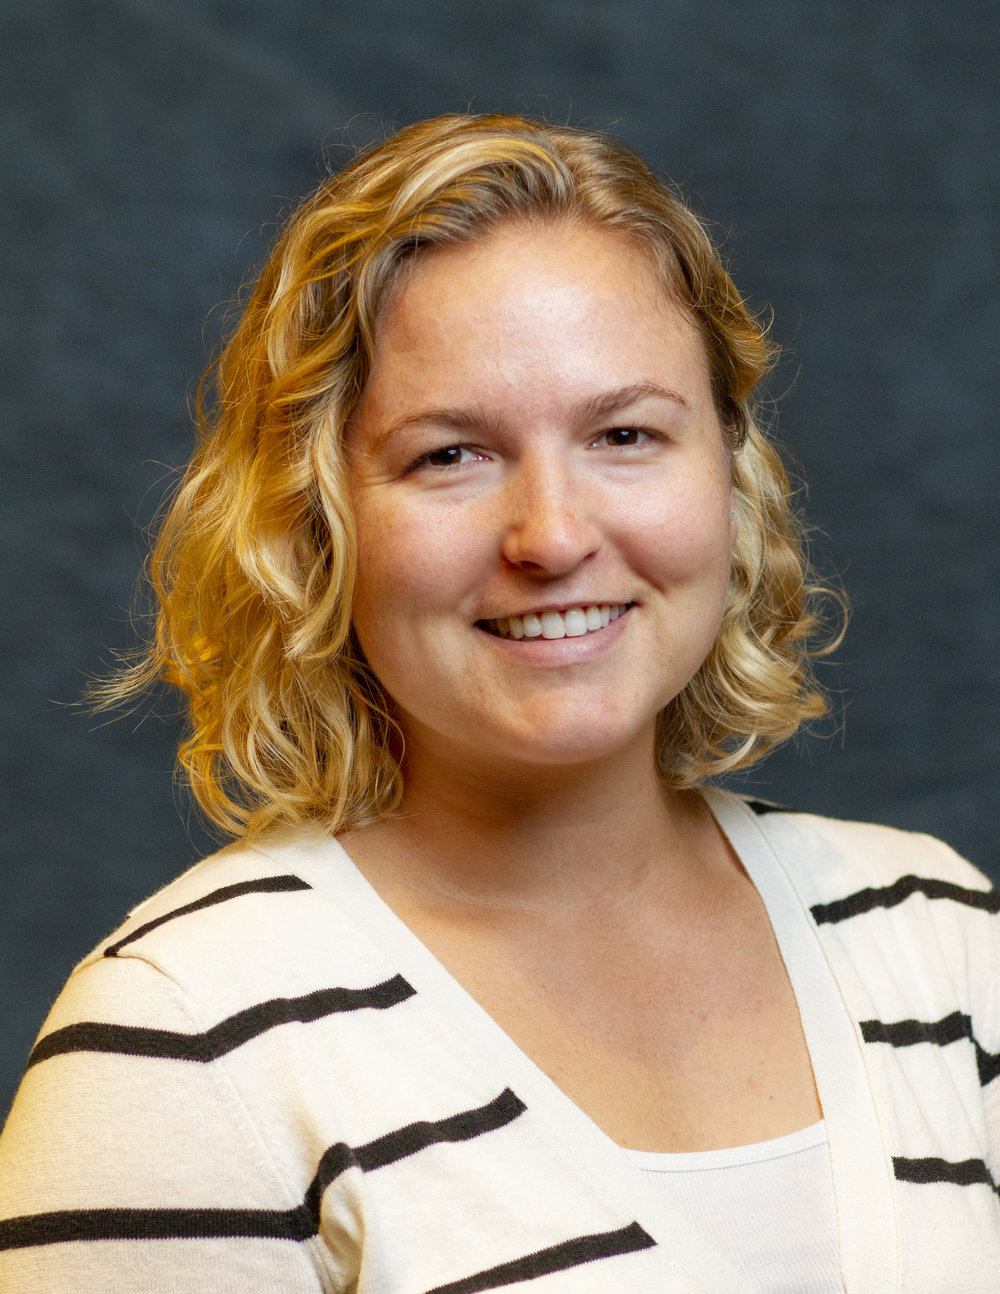 Andrea Patton - EDUCATIONMaster's Degree:In Process at Santa Clara UniversityBachelor's Degree:Cal Poly San Luis Obispo CLINICSan Jose